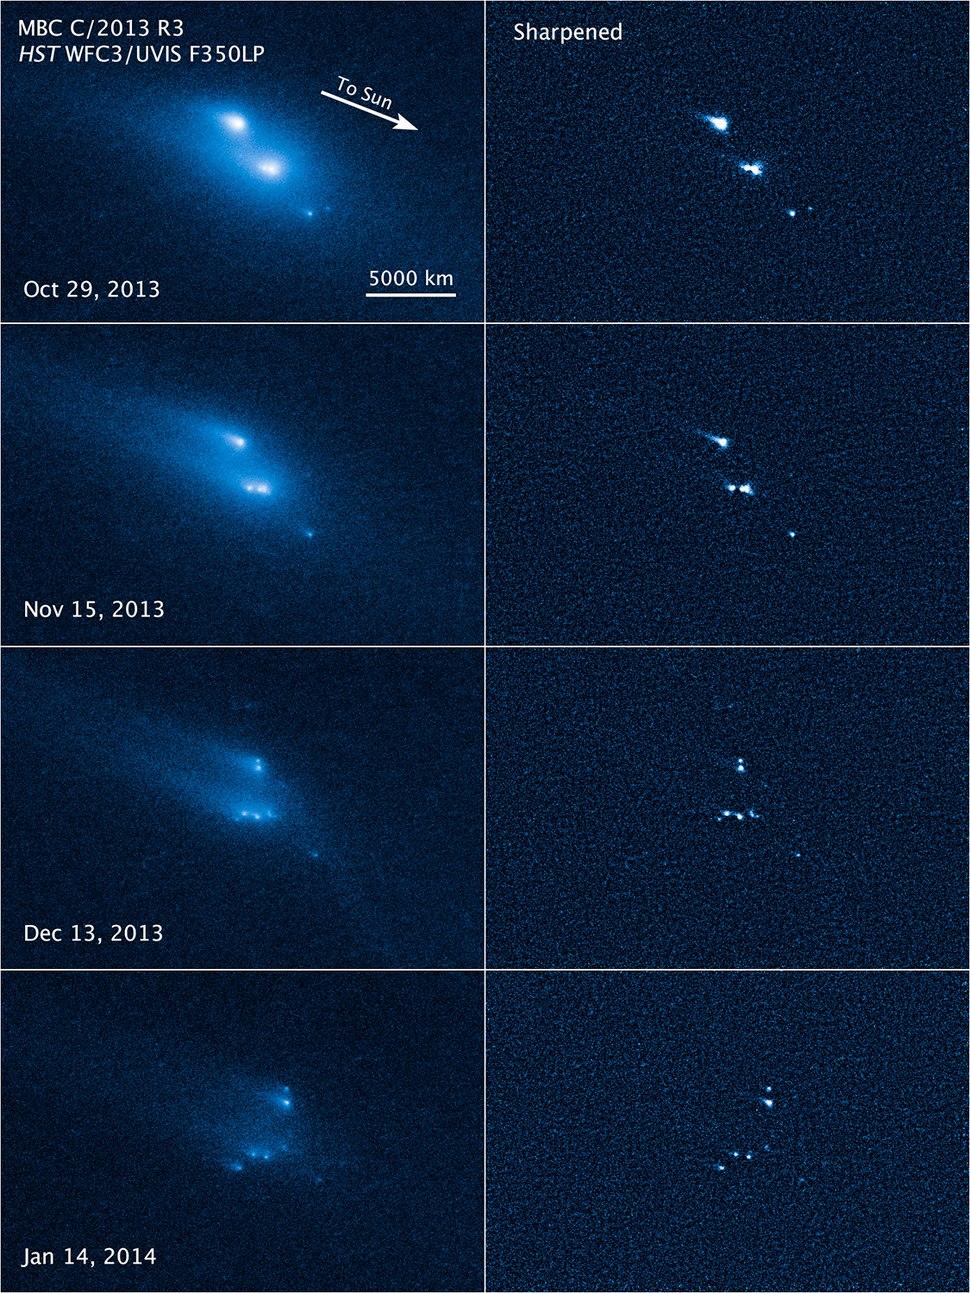 14060-Asteroid-P2013R3-Disintegration-20140306